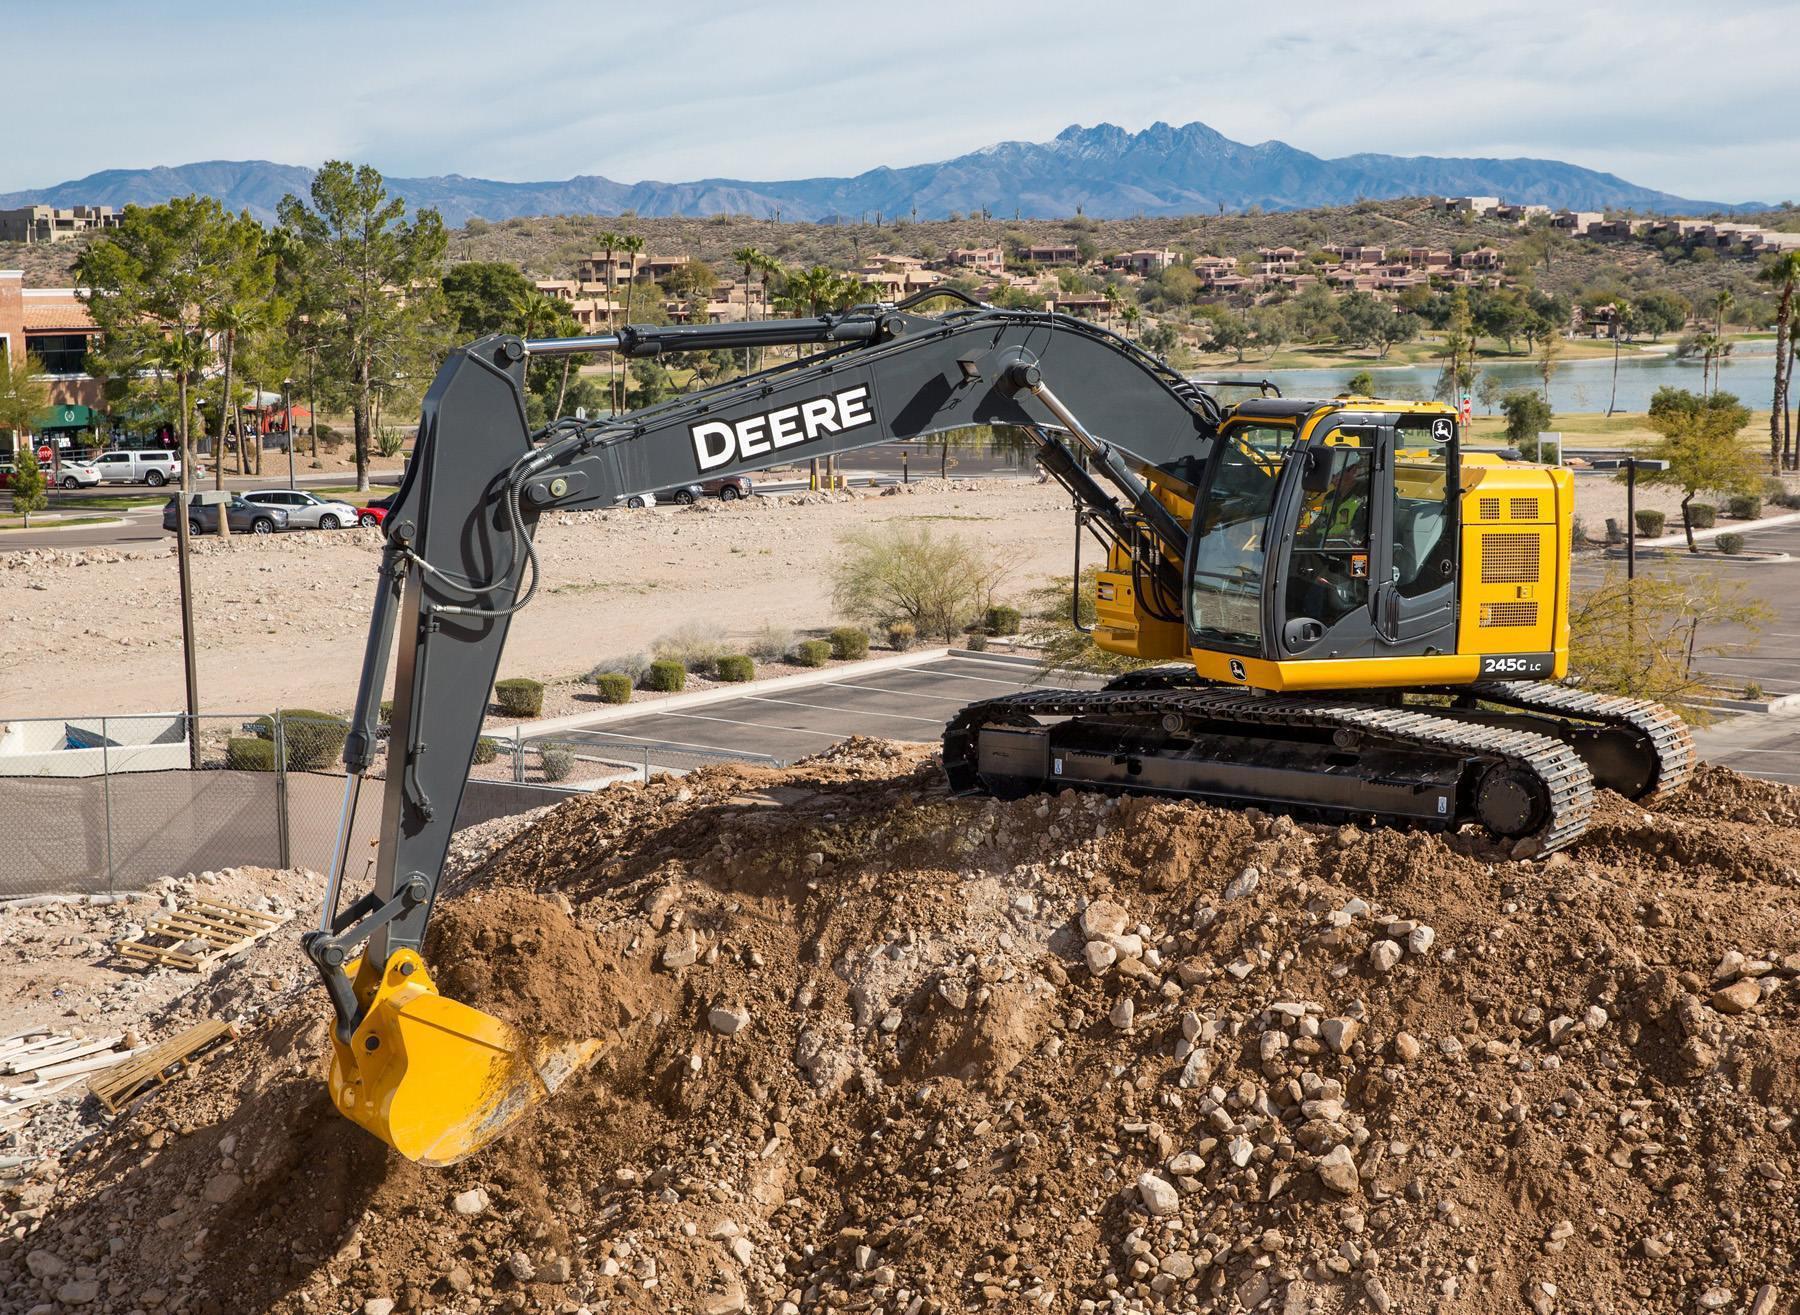 John Deere updates 135G, 245G LC excavators with engine, hydraulic improvements